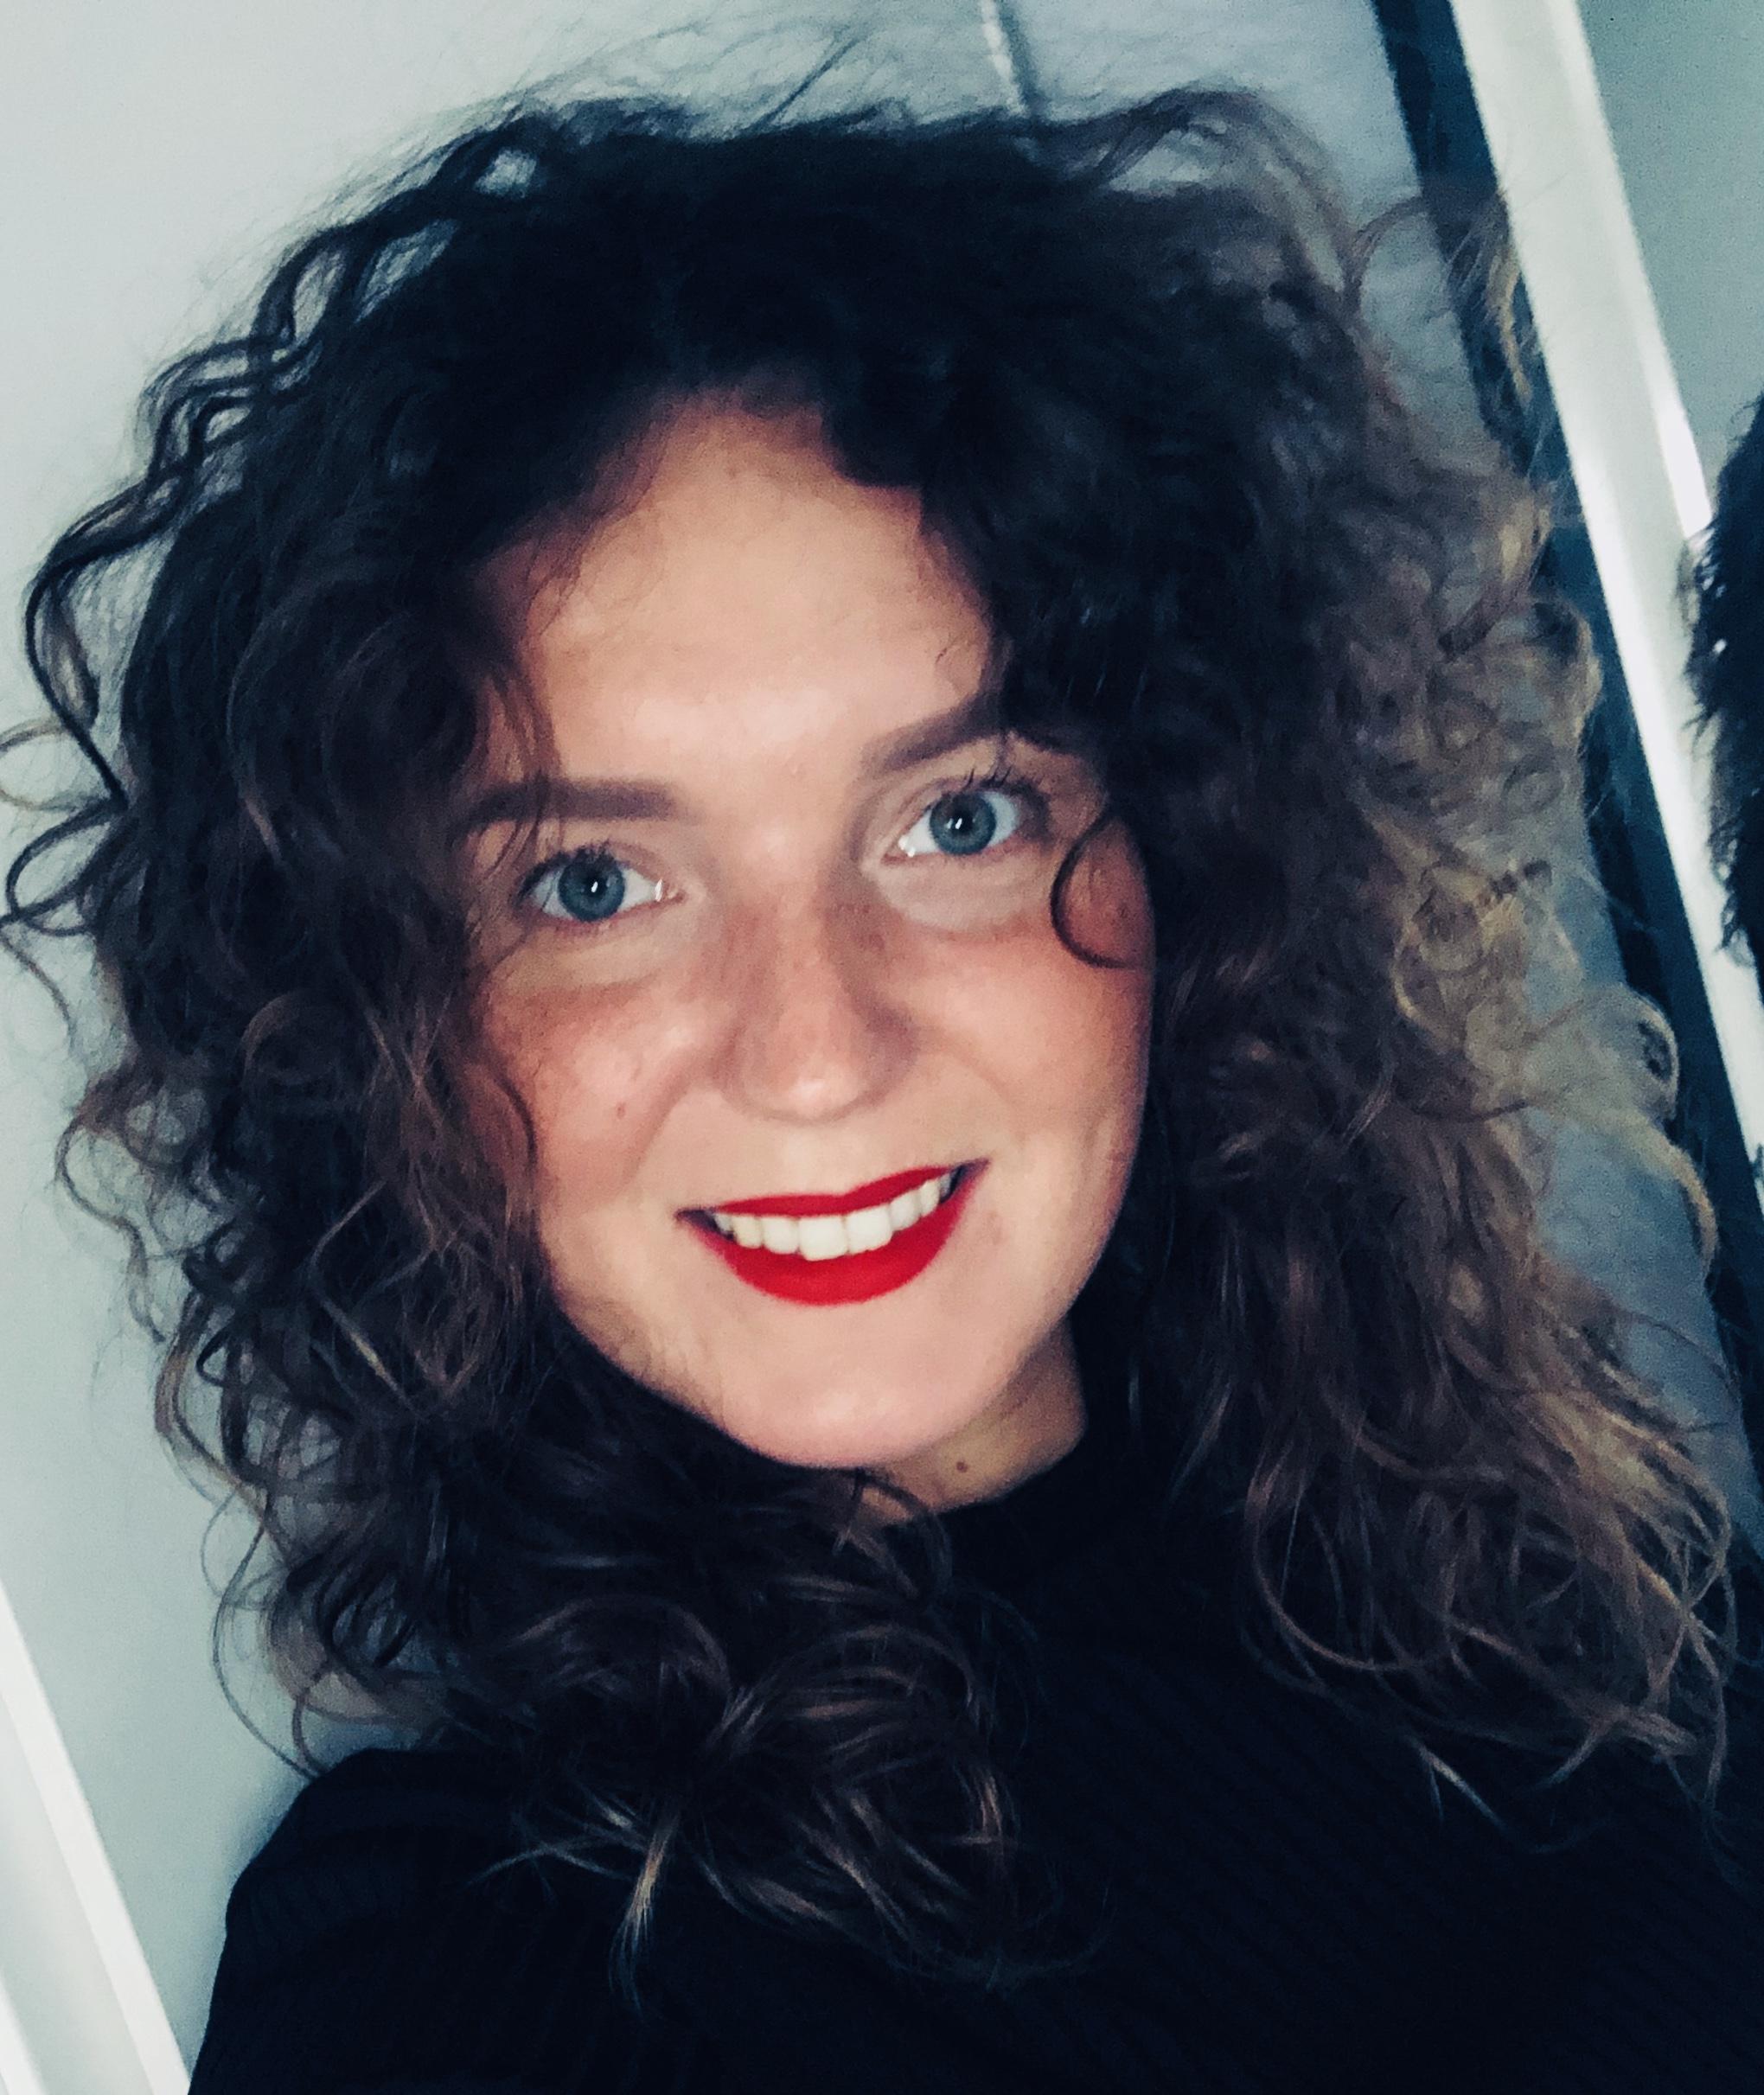 Sanne - Kapper bij HADA HAIR | KrullenKapper.Com Arnhem